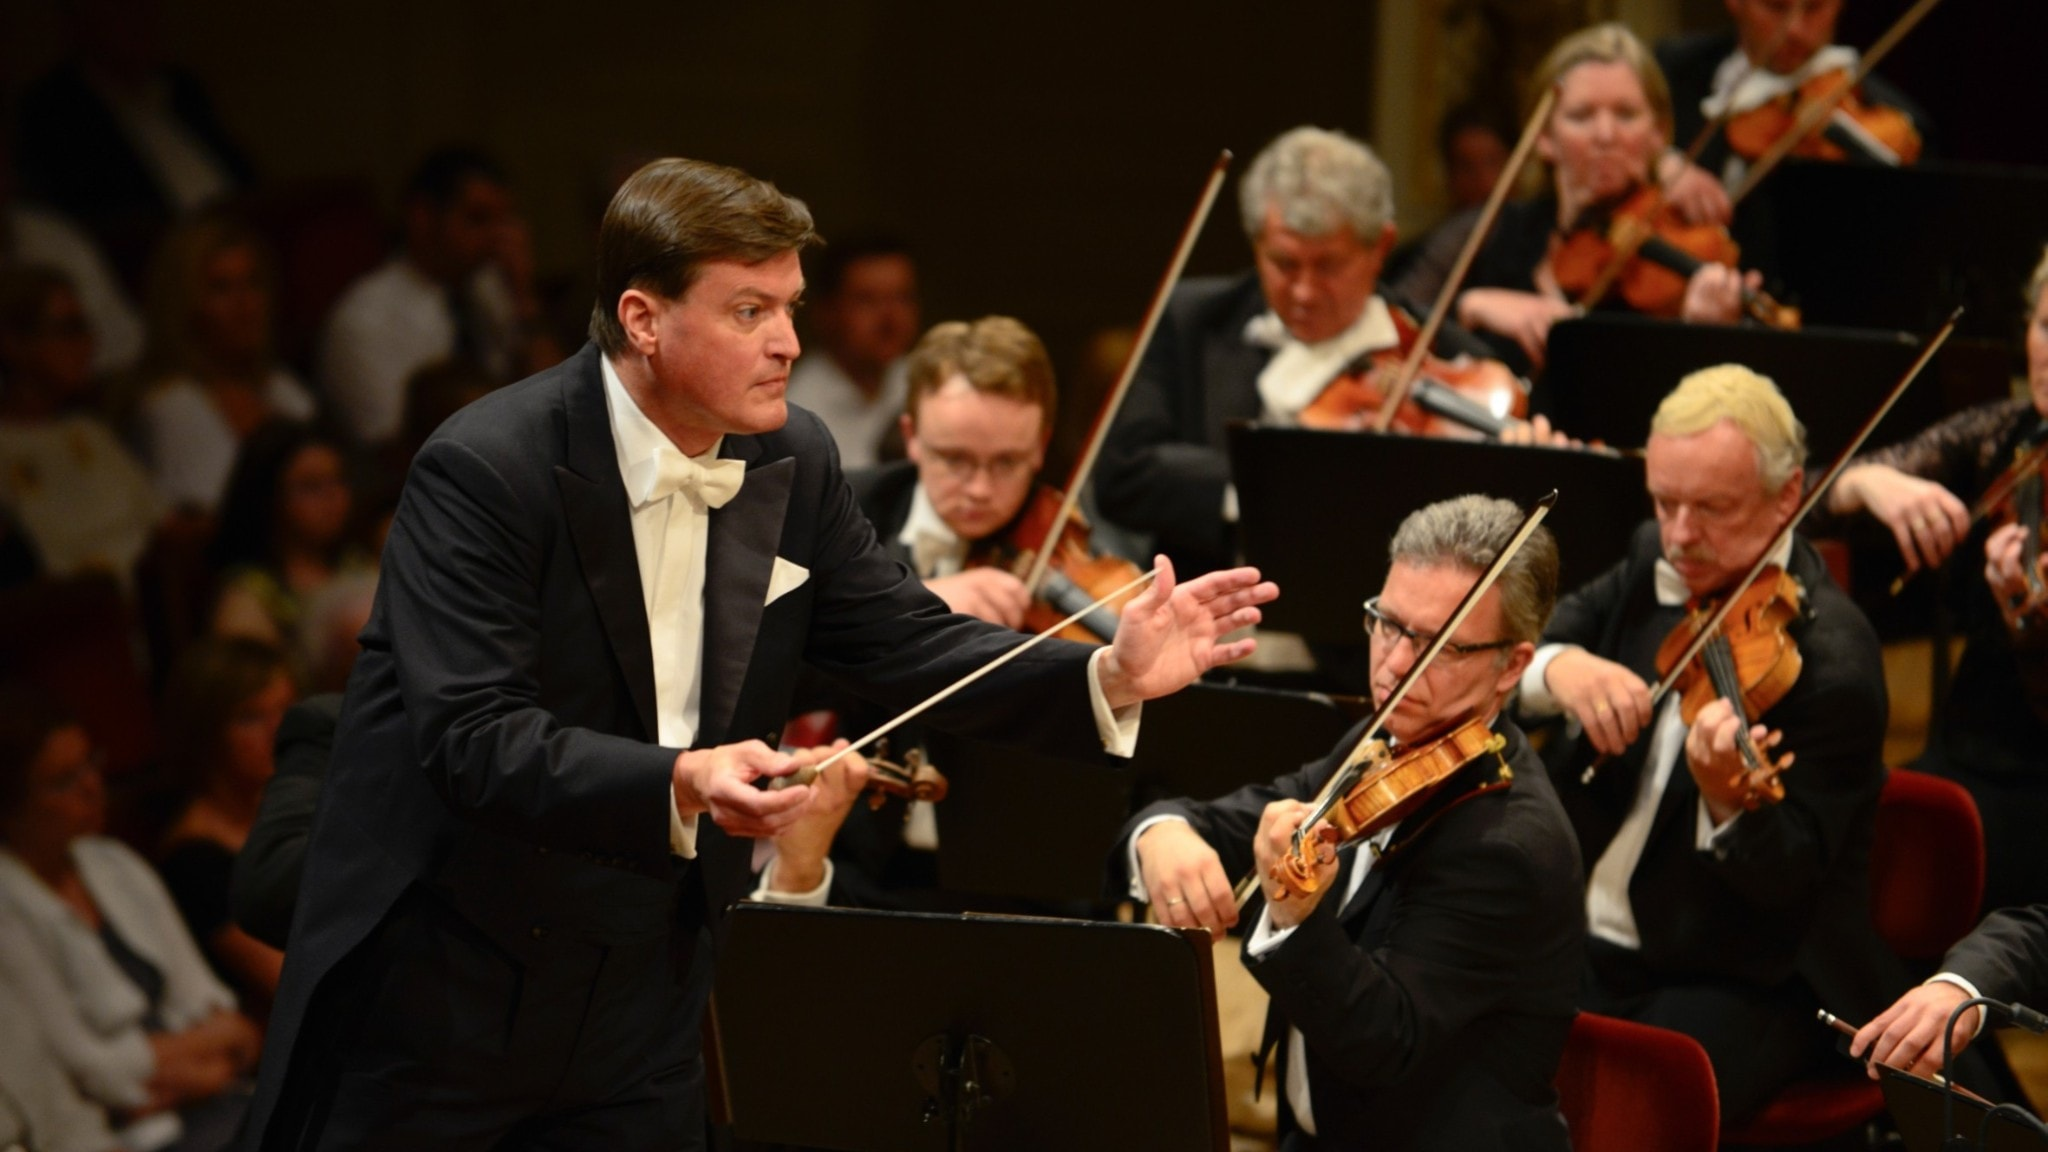 Dirigenten Christian Thielemann och Dresdens statskapell